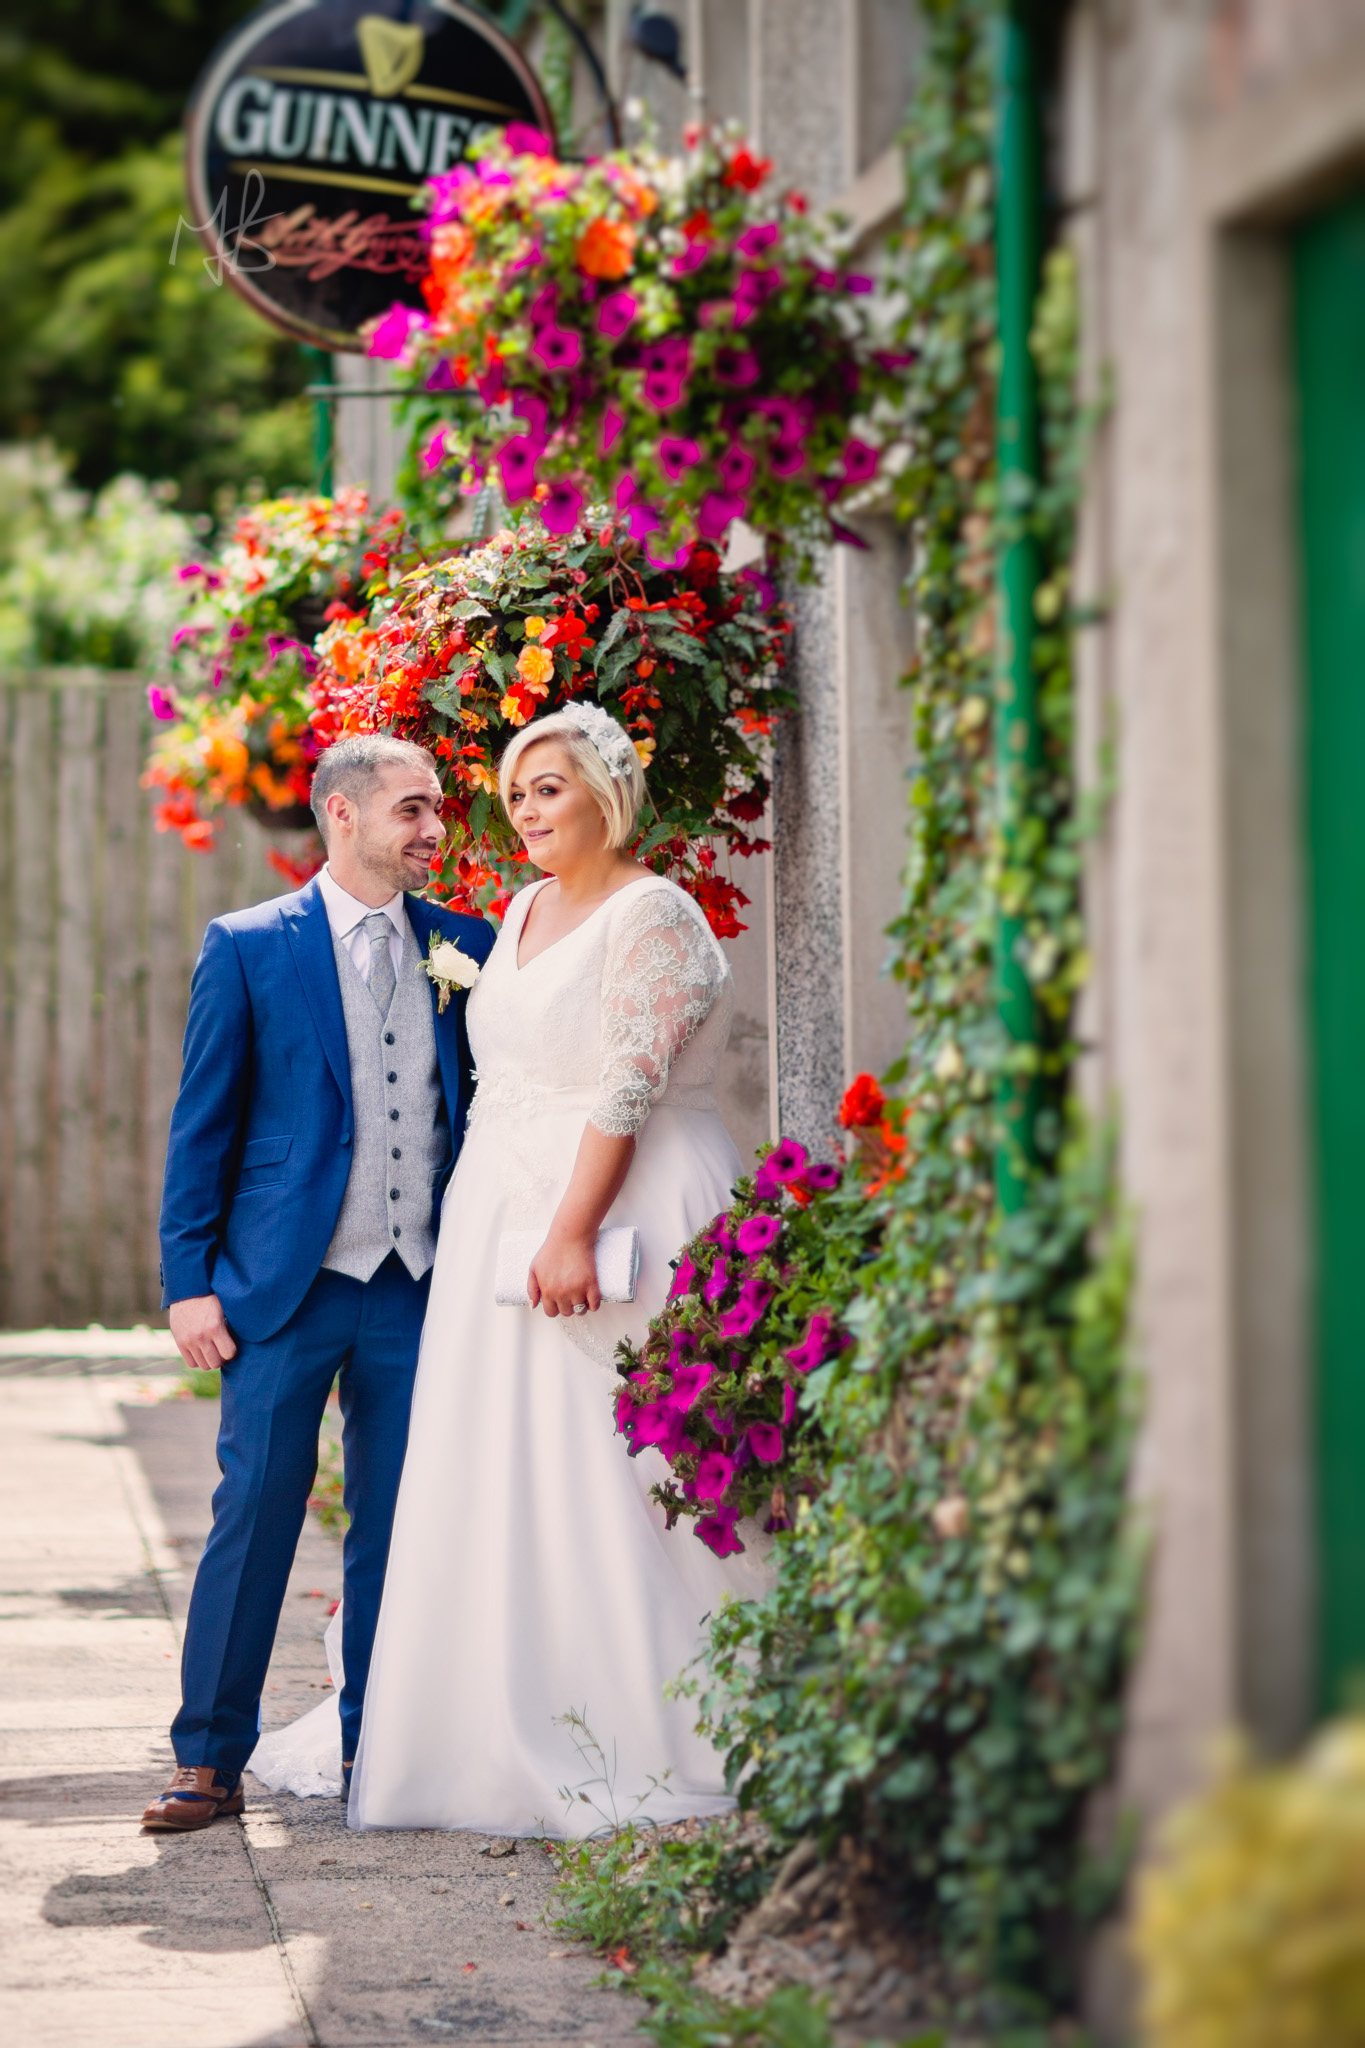 Northern-Ireland-Wedding-Photographer-Mark-Barnes-Ballymena_wedding-photography-Leighinmohr-House-Seamas_Alanna_For-web-28.jpg